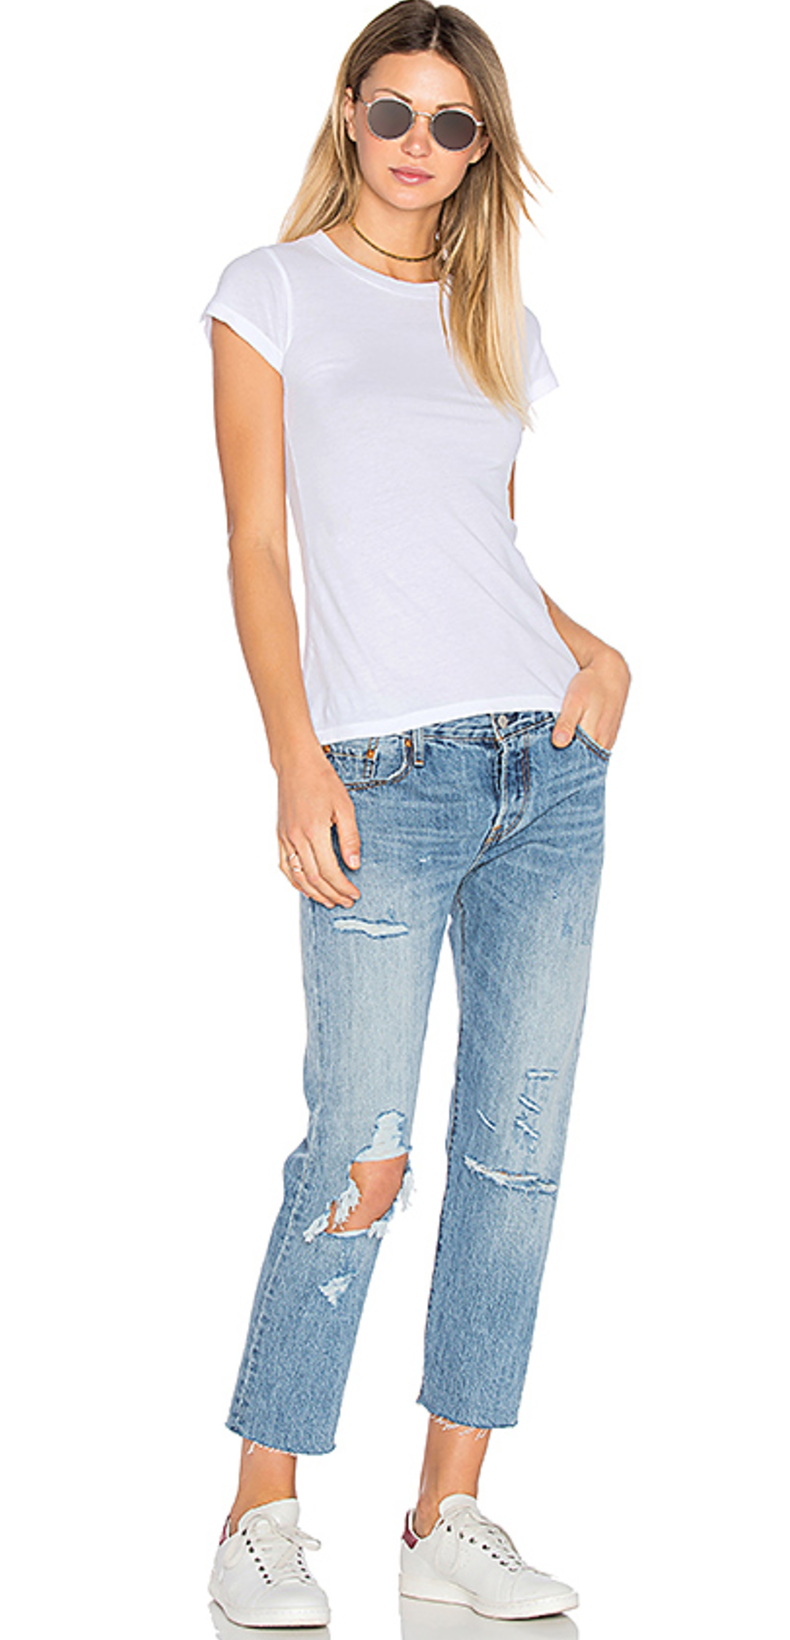 Levis jeans, LA made tee